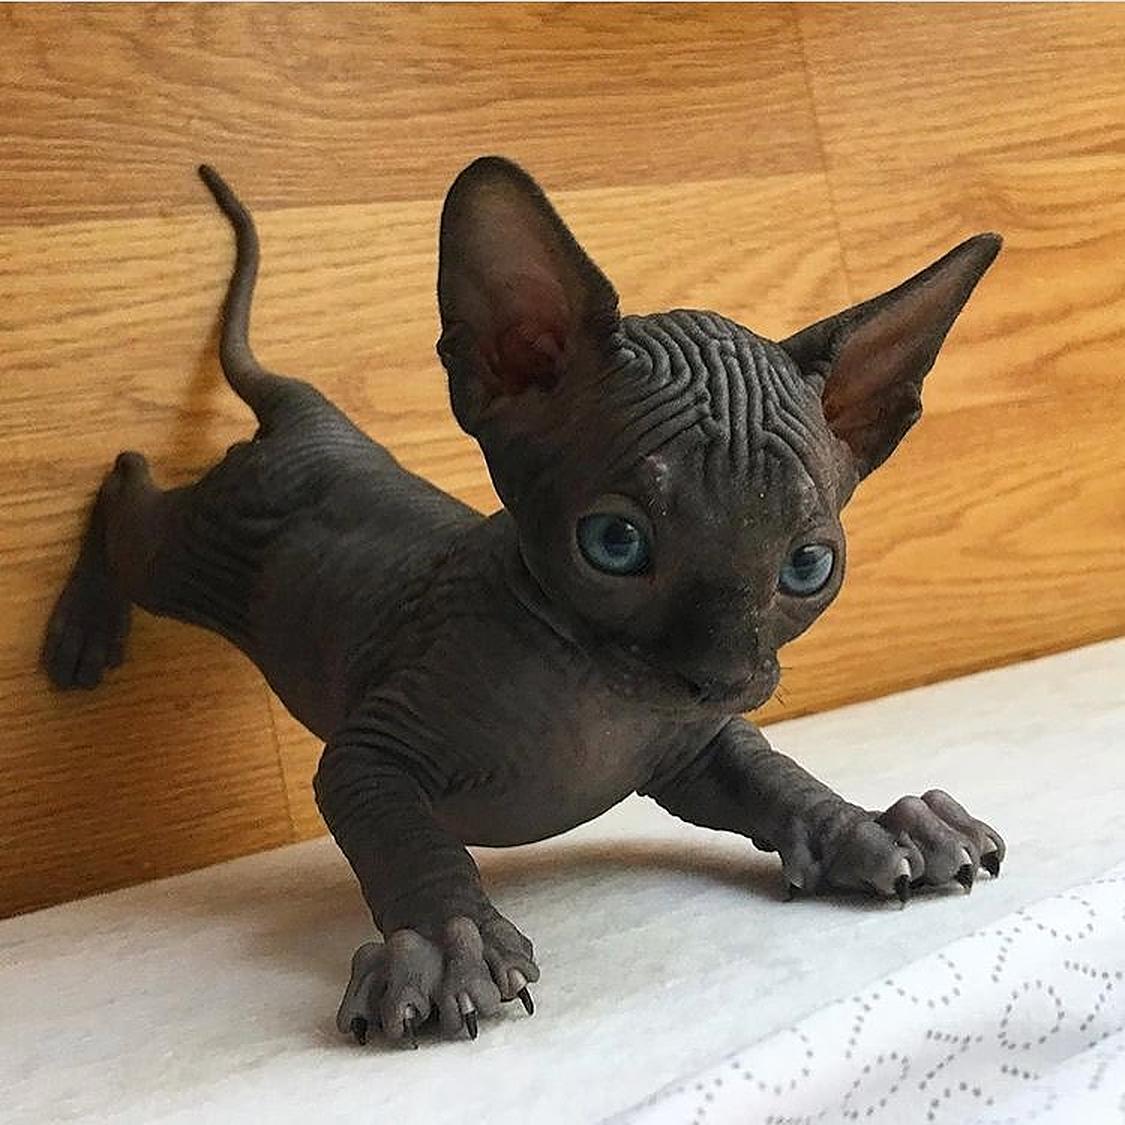 A Little Sphynx Kitten Cute Hairless Cat Hairless Kitten Cute Animals